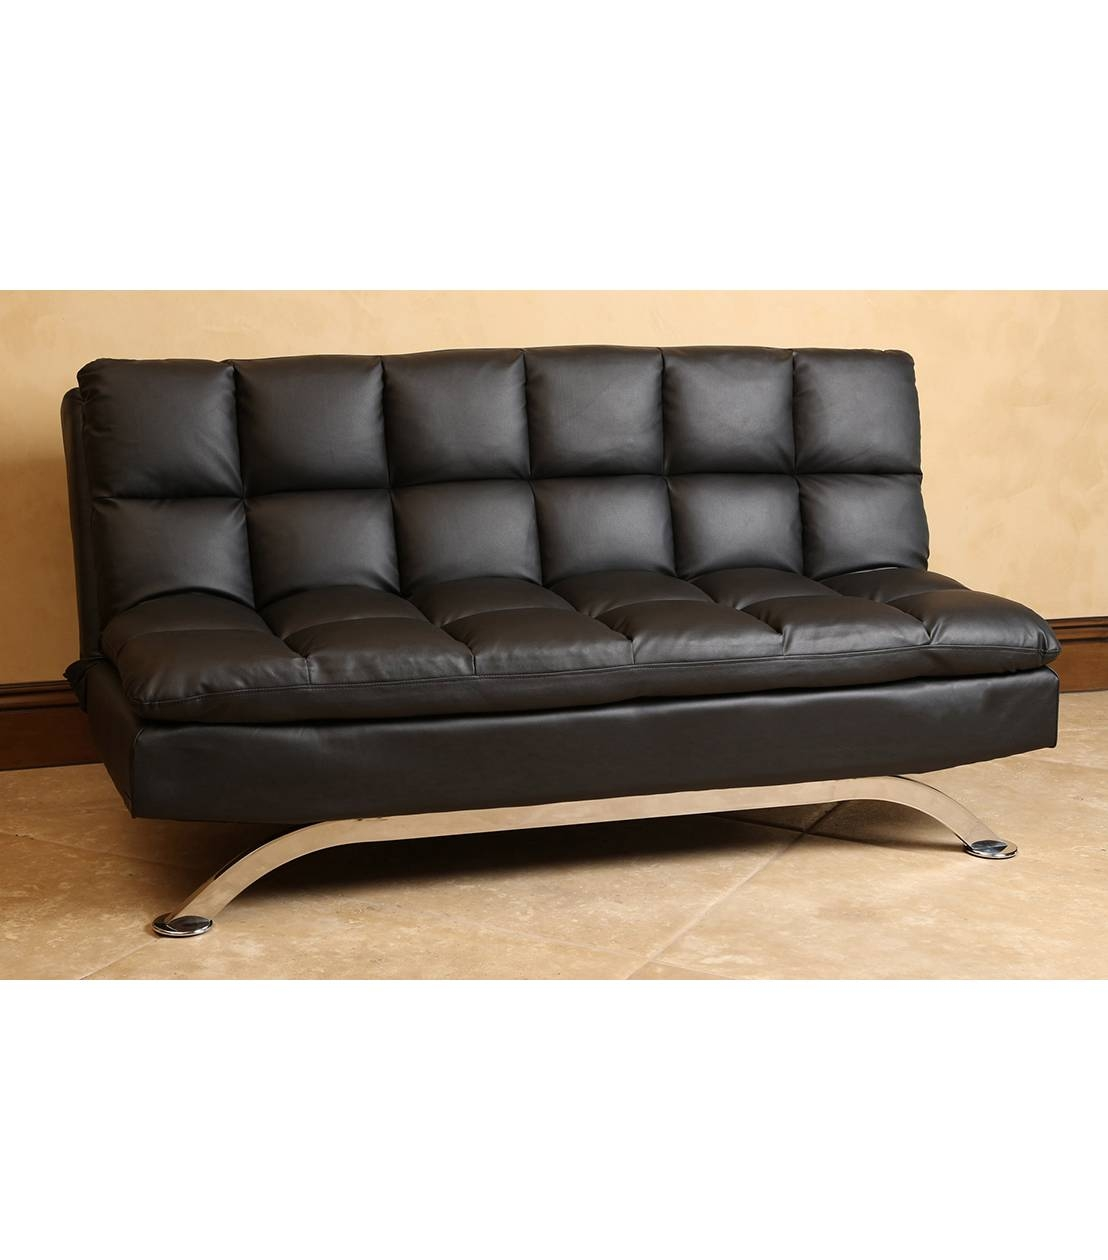 Futons : Vienna Leather Futon Sofa within Euro Lounger Sofa Beds (Image 9 of 15)